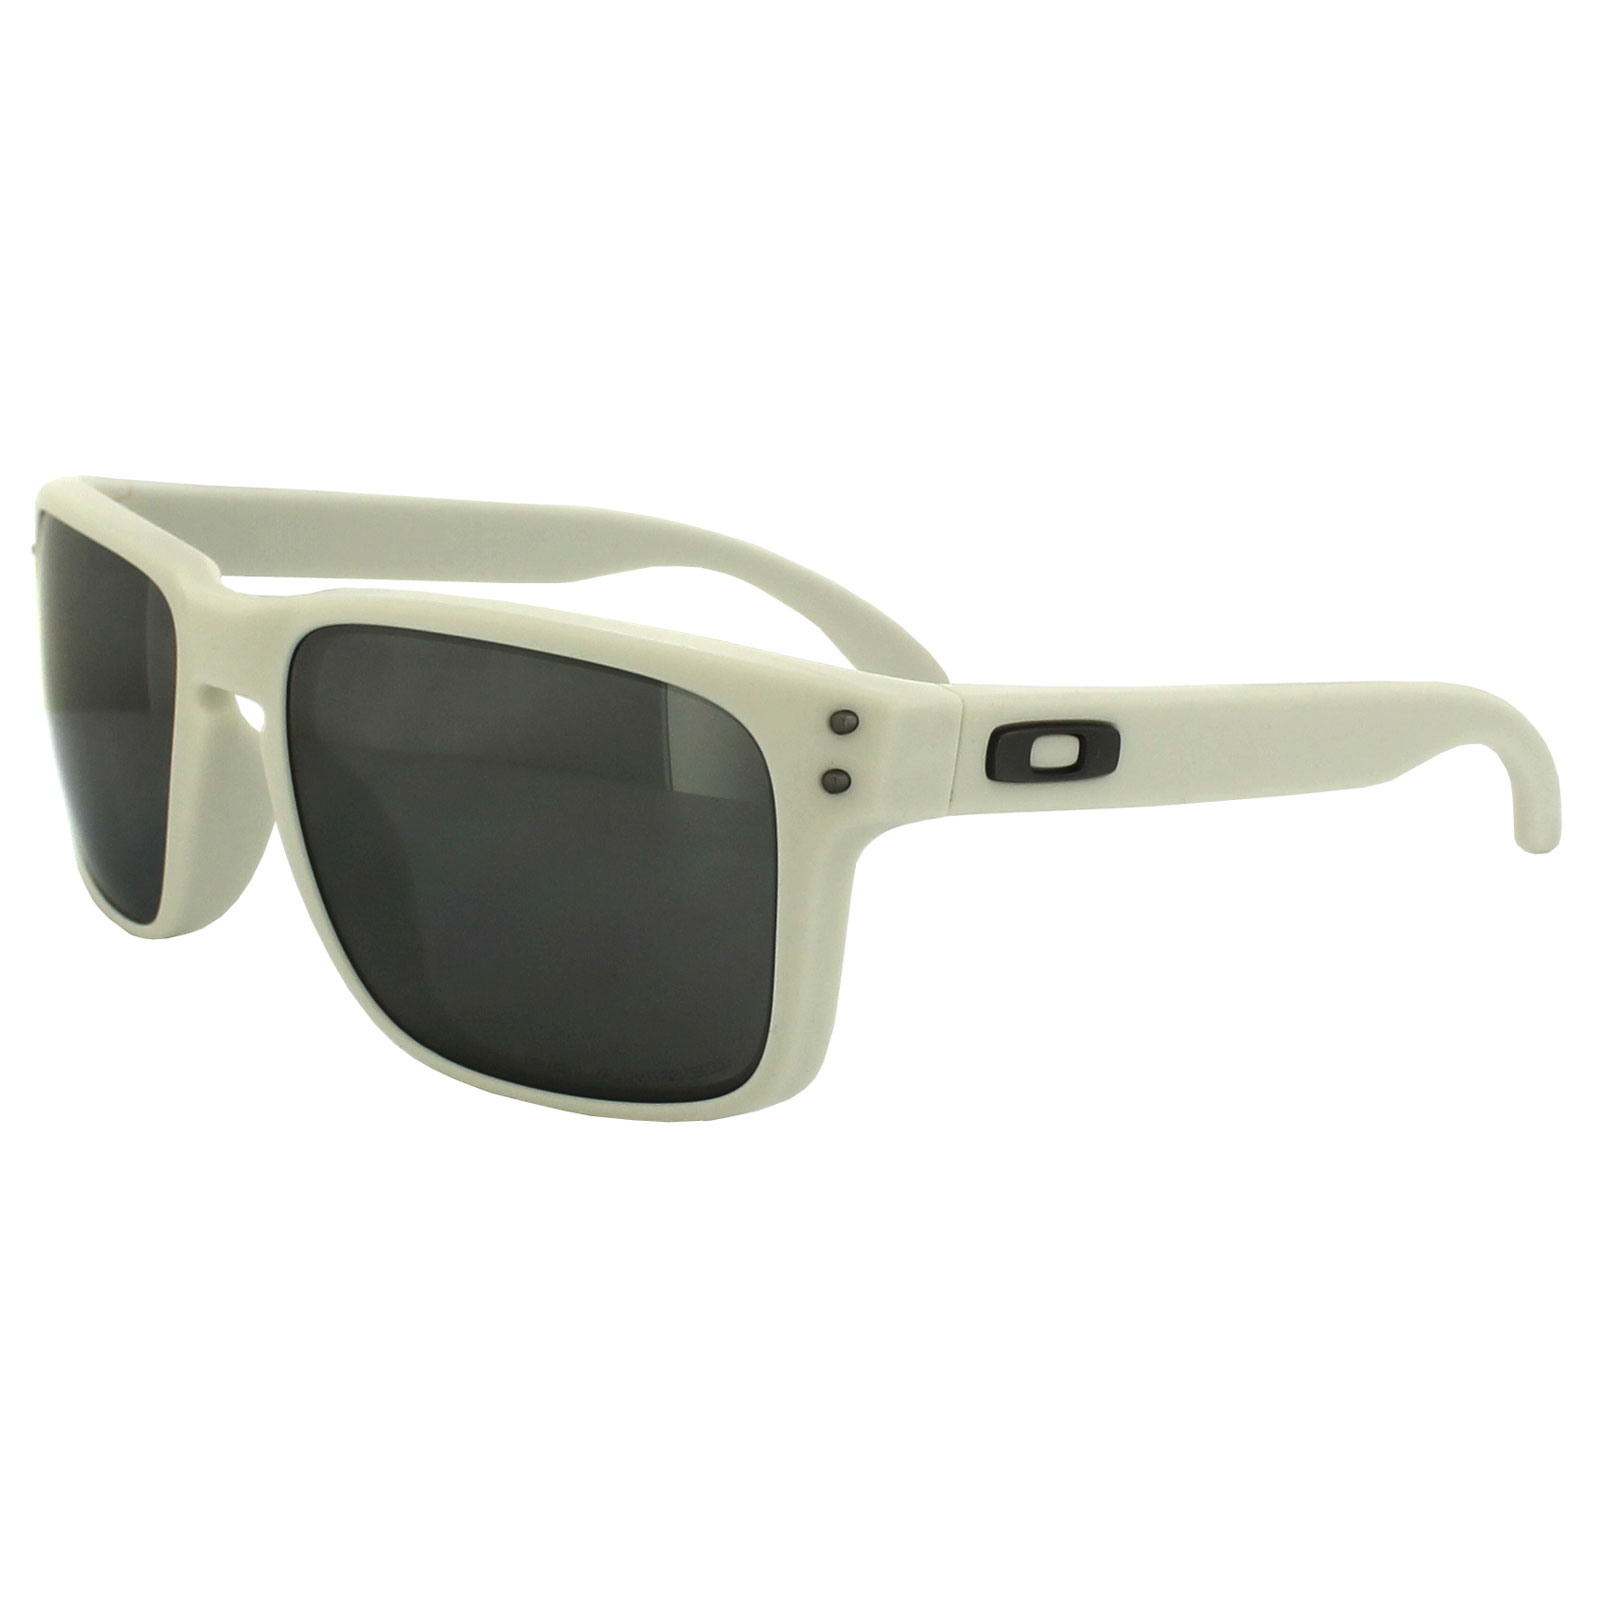 black oakley holbrook sunglasses jogy  black oakley holbrook sunglasses